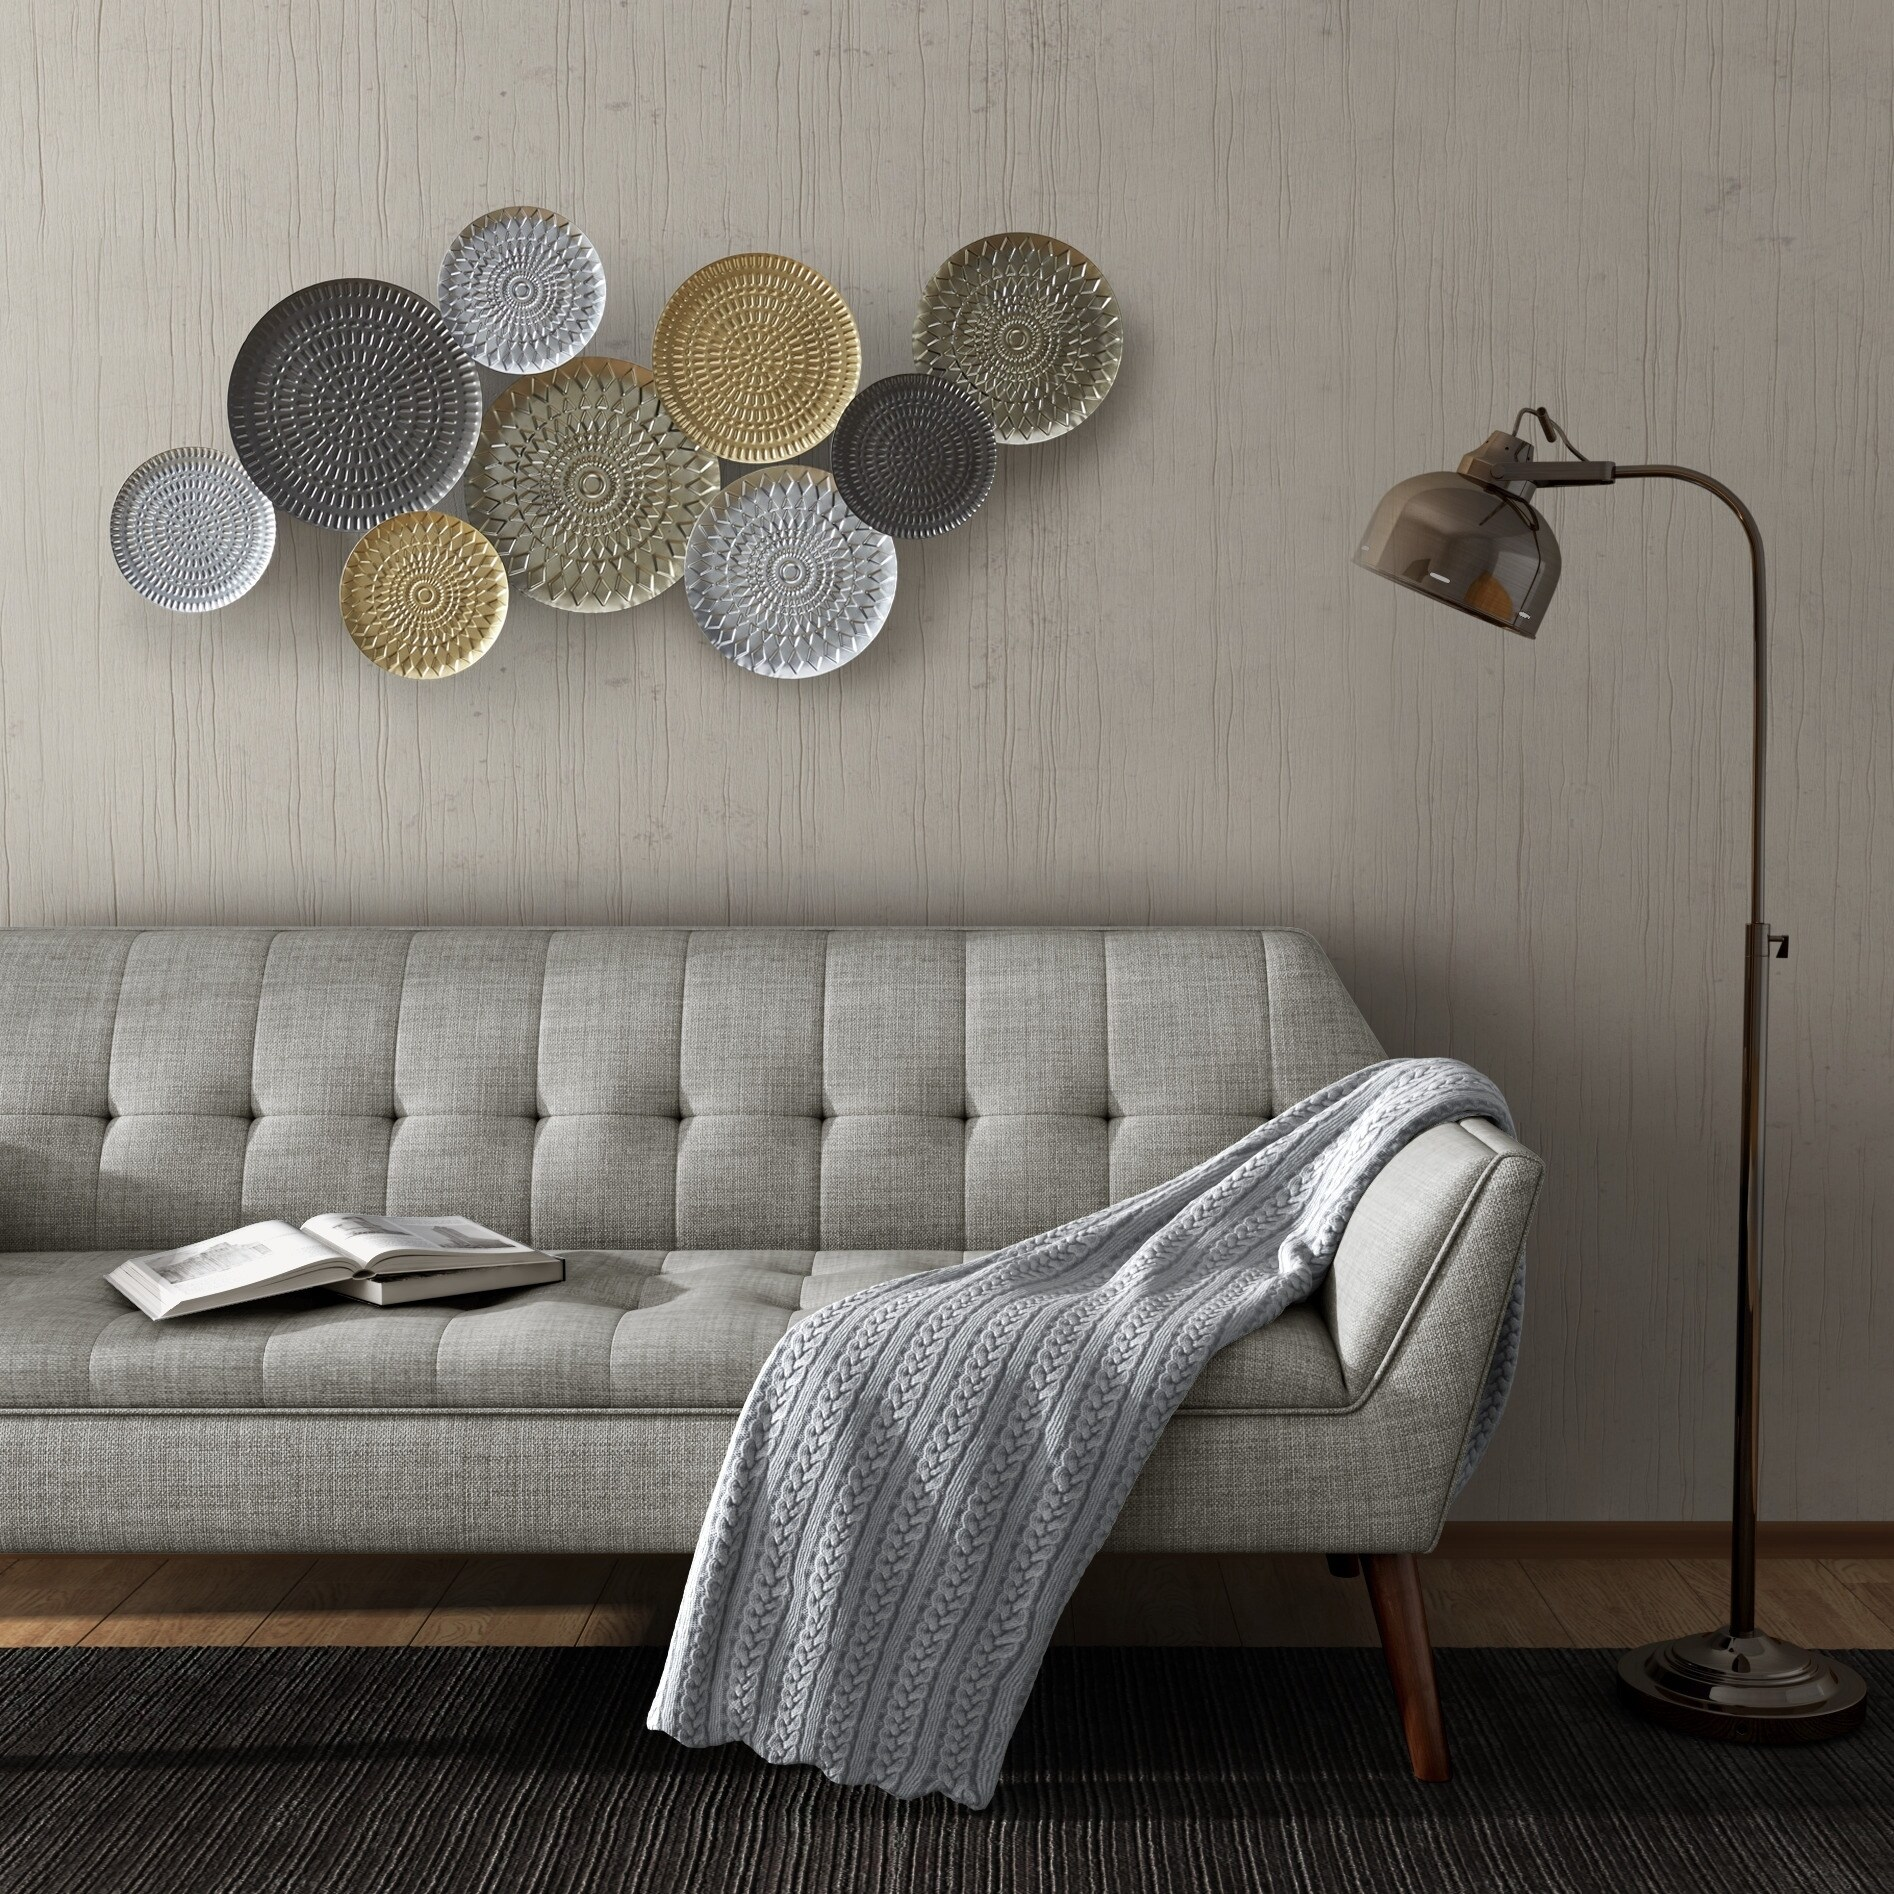 Motley Metal Plates Wall Decor